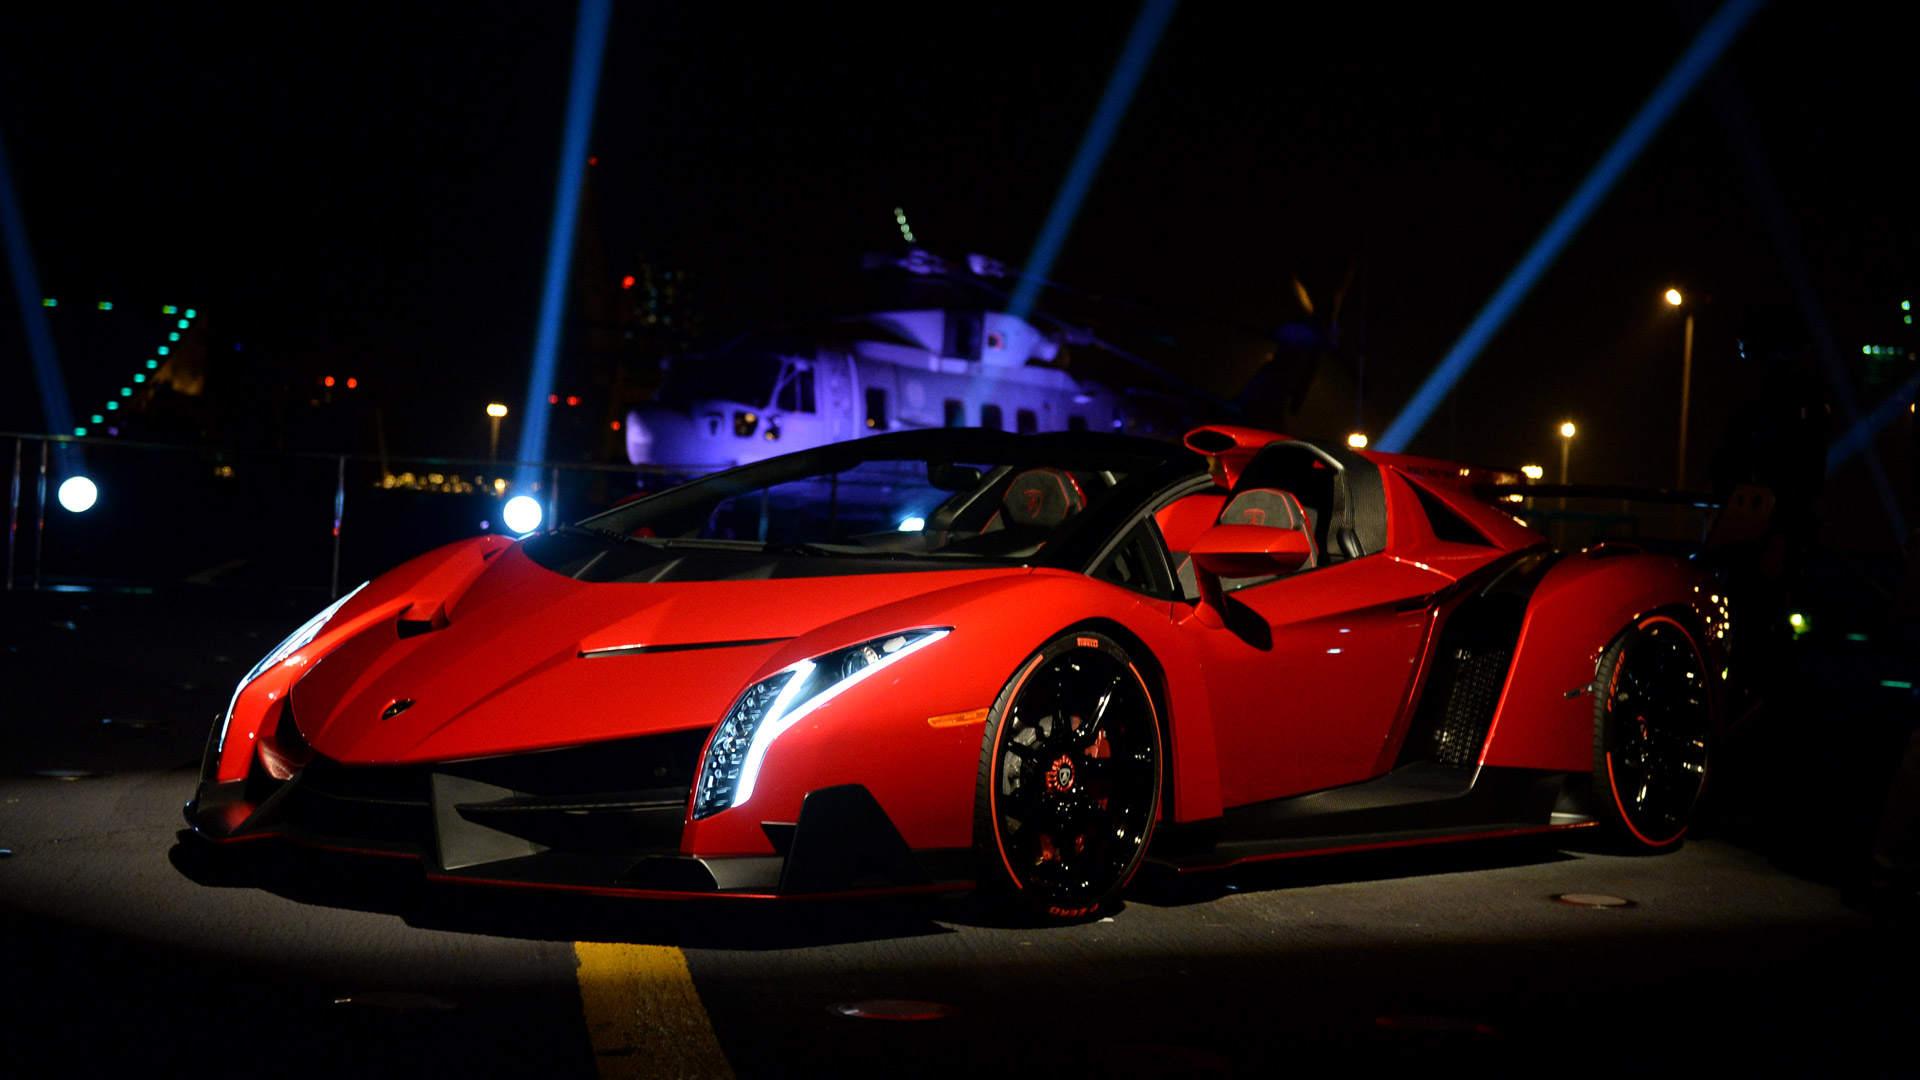 3 Lamborghini Veneno Roadster Hd Wallpapers Backgrounds